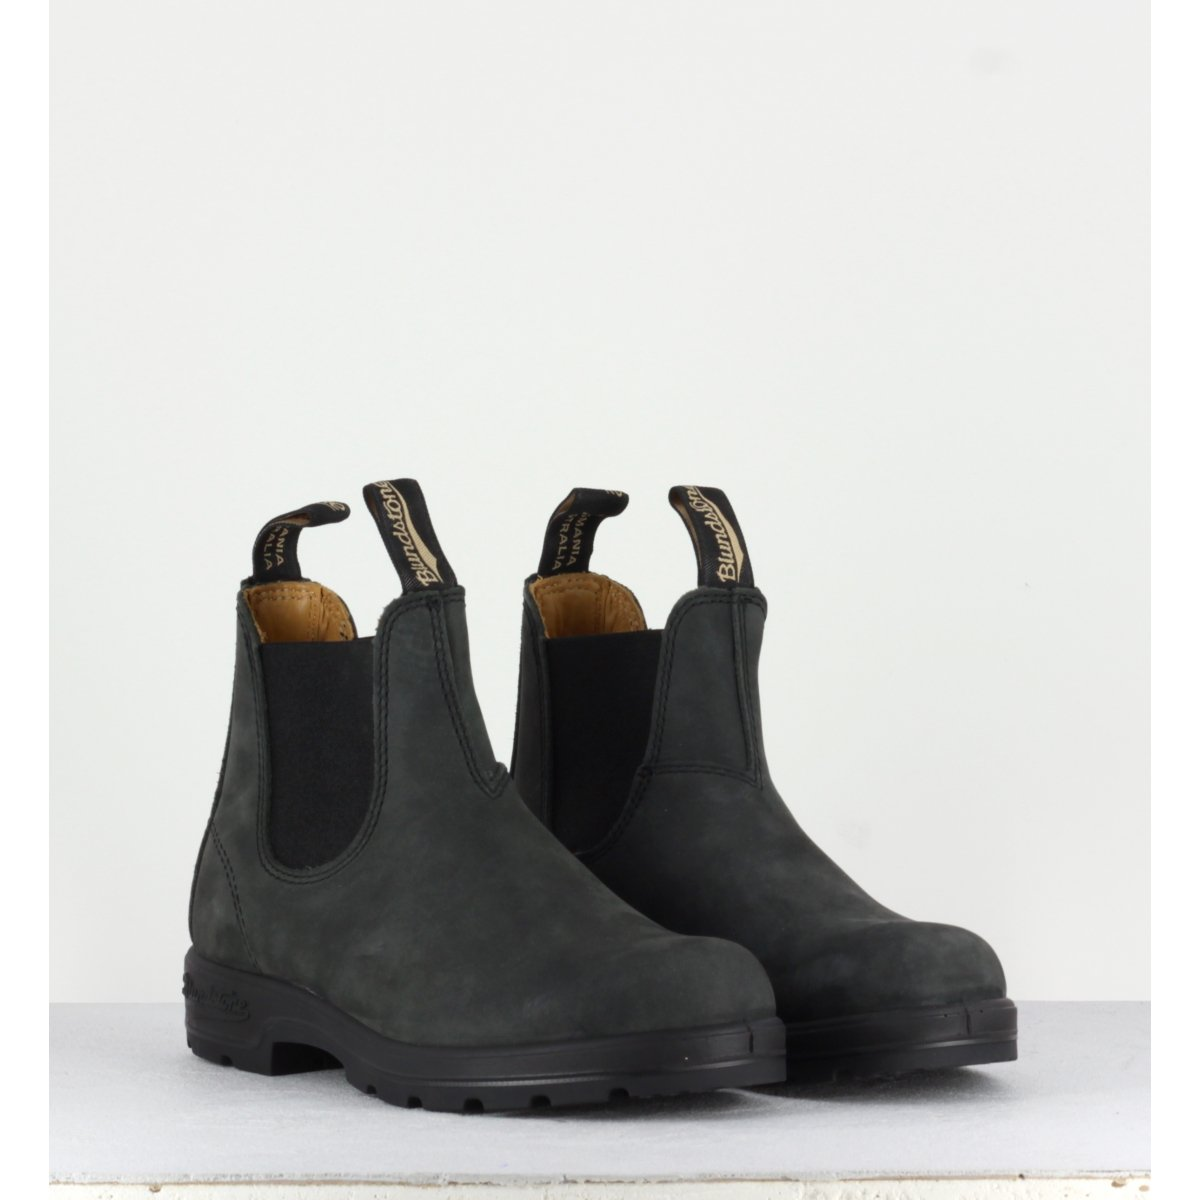 Bottines noir Blundstone  femme - CLASSIC CHELSEA BOOT 587N